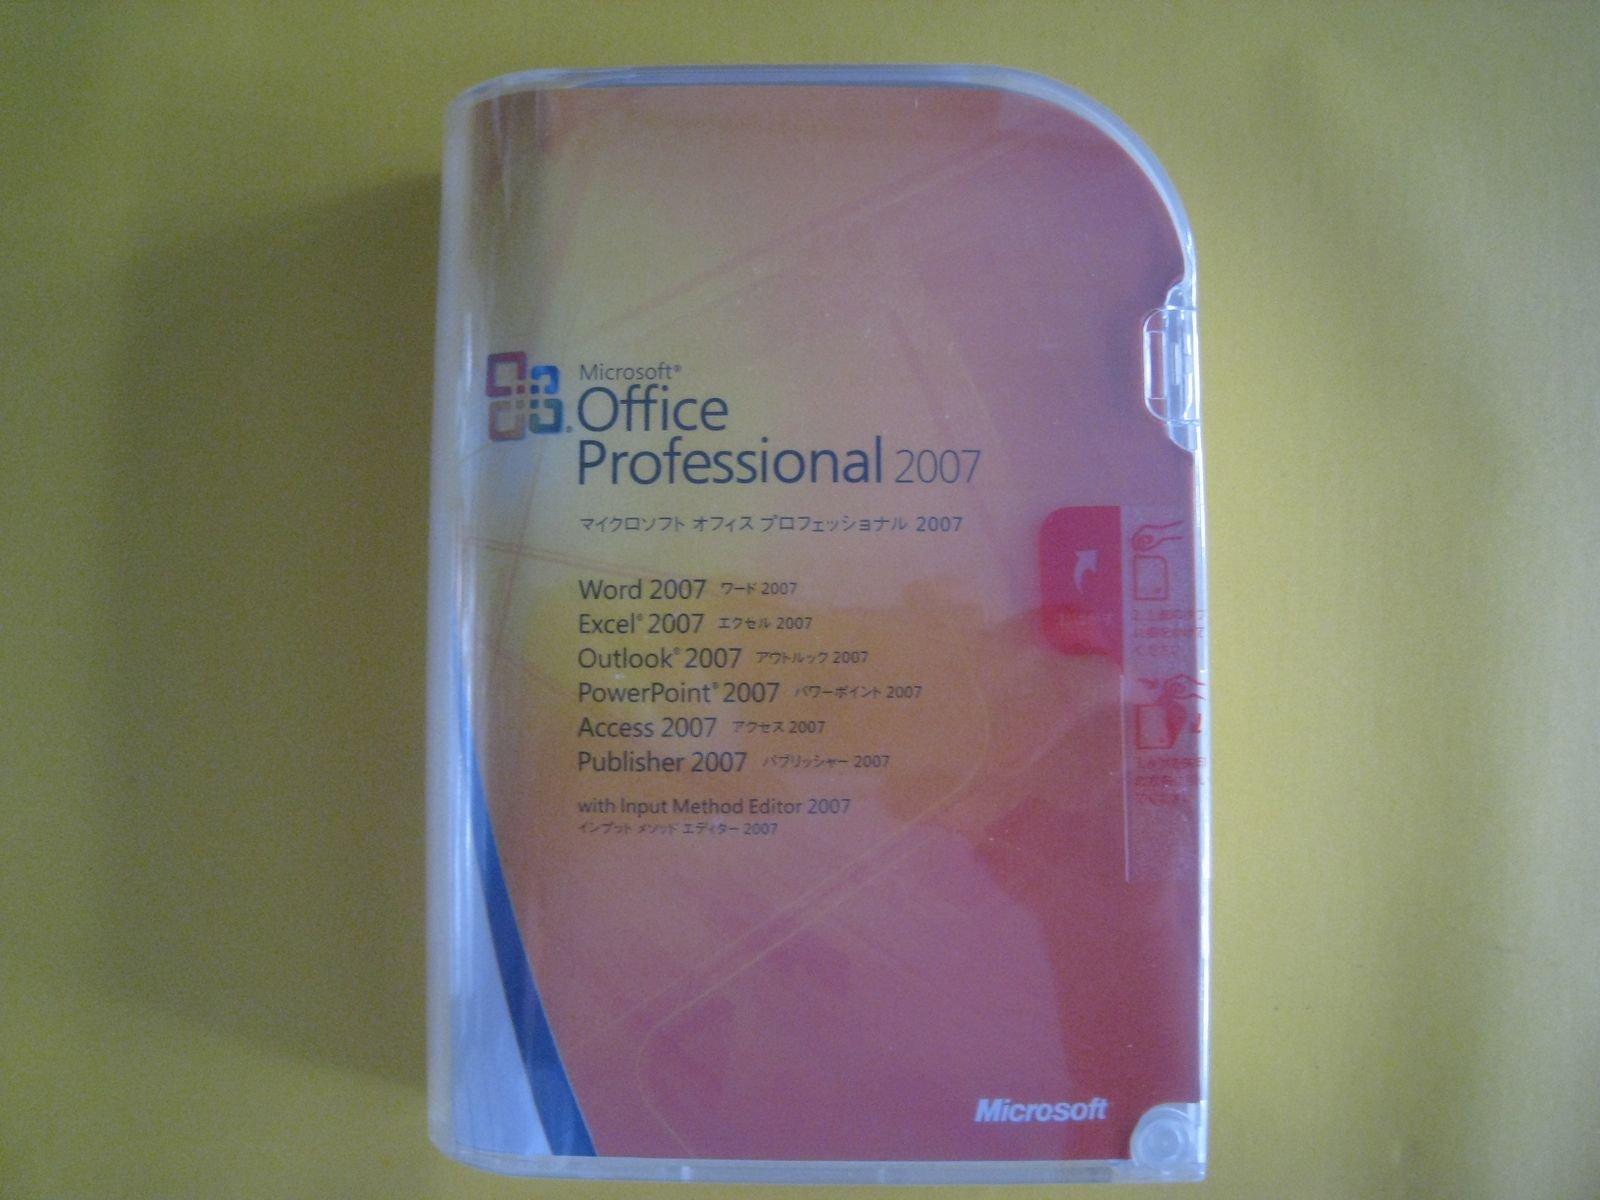 Microsoft Office Pro 2007 10